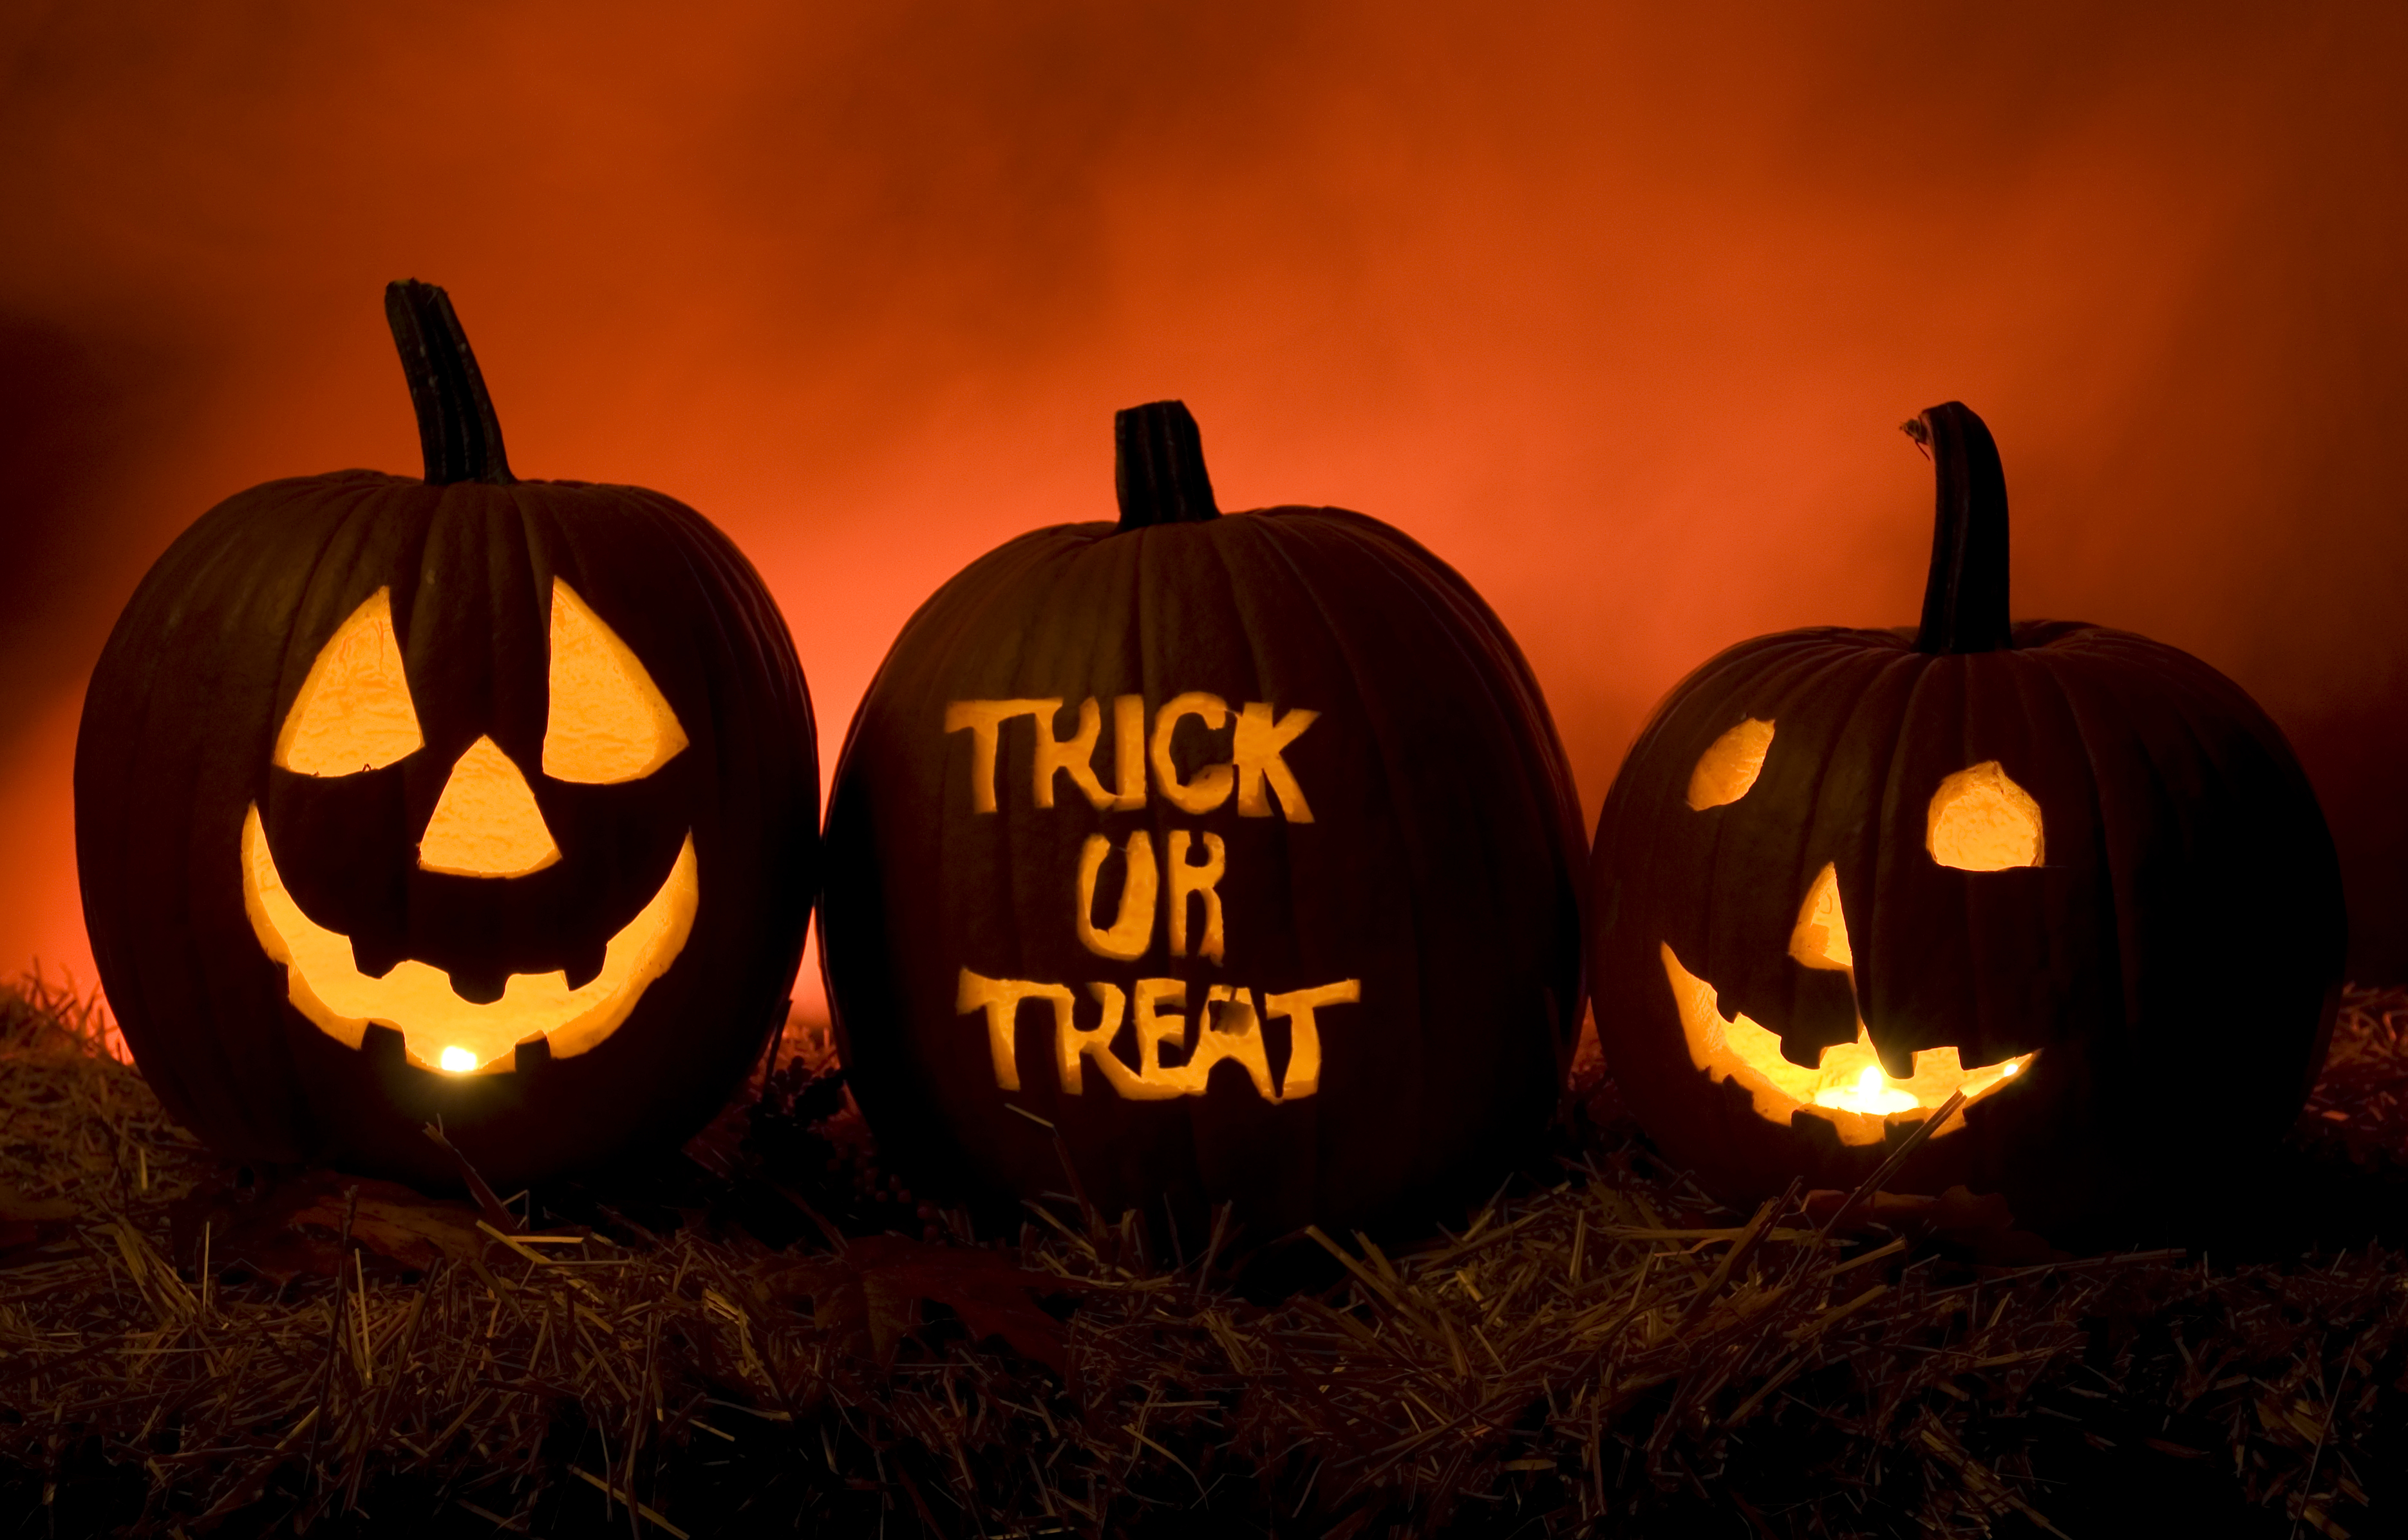 bandeau Halloween